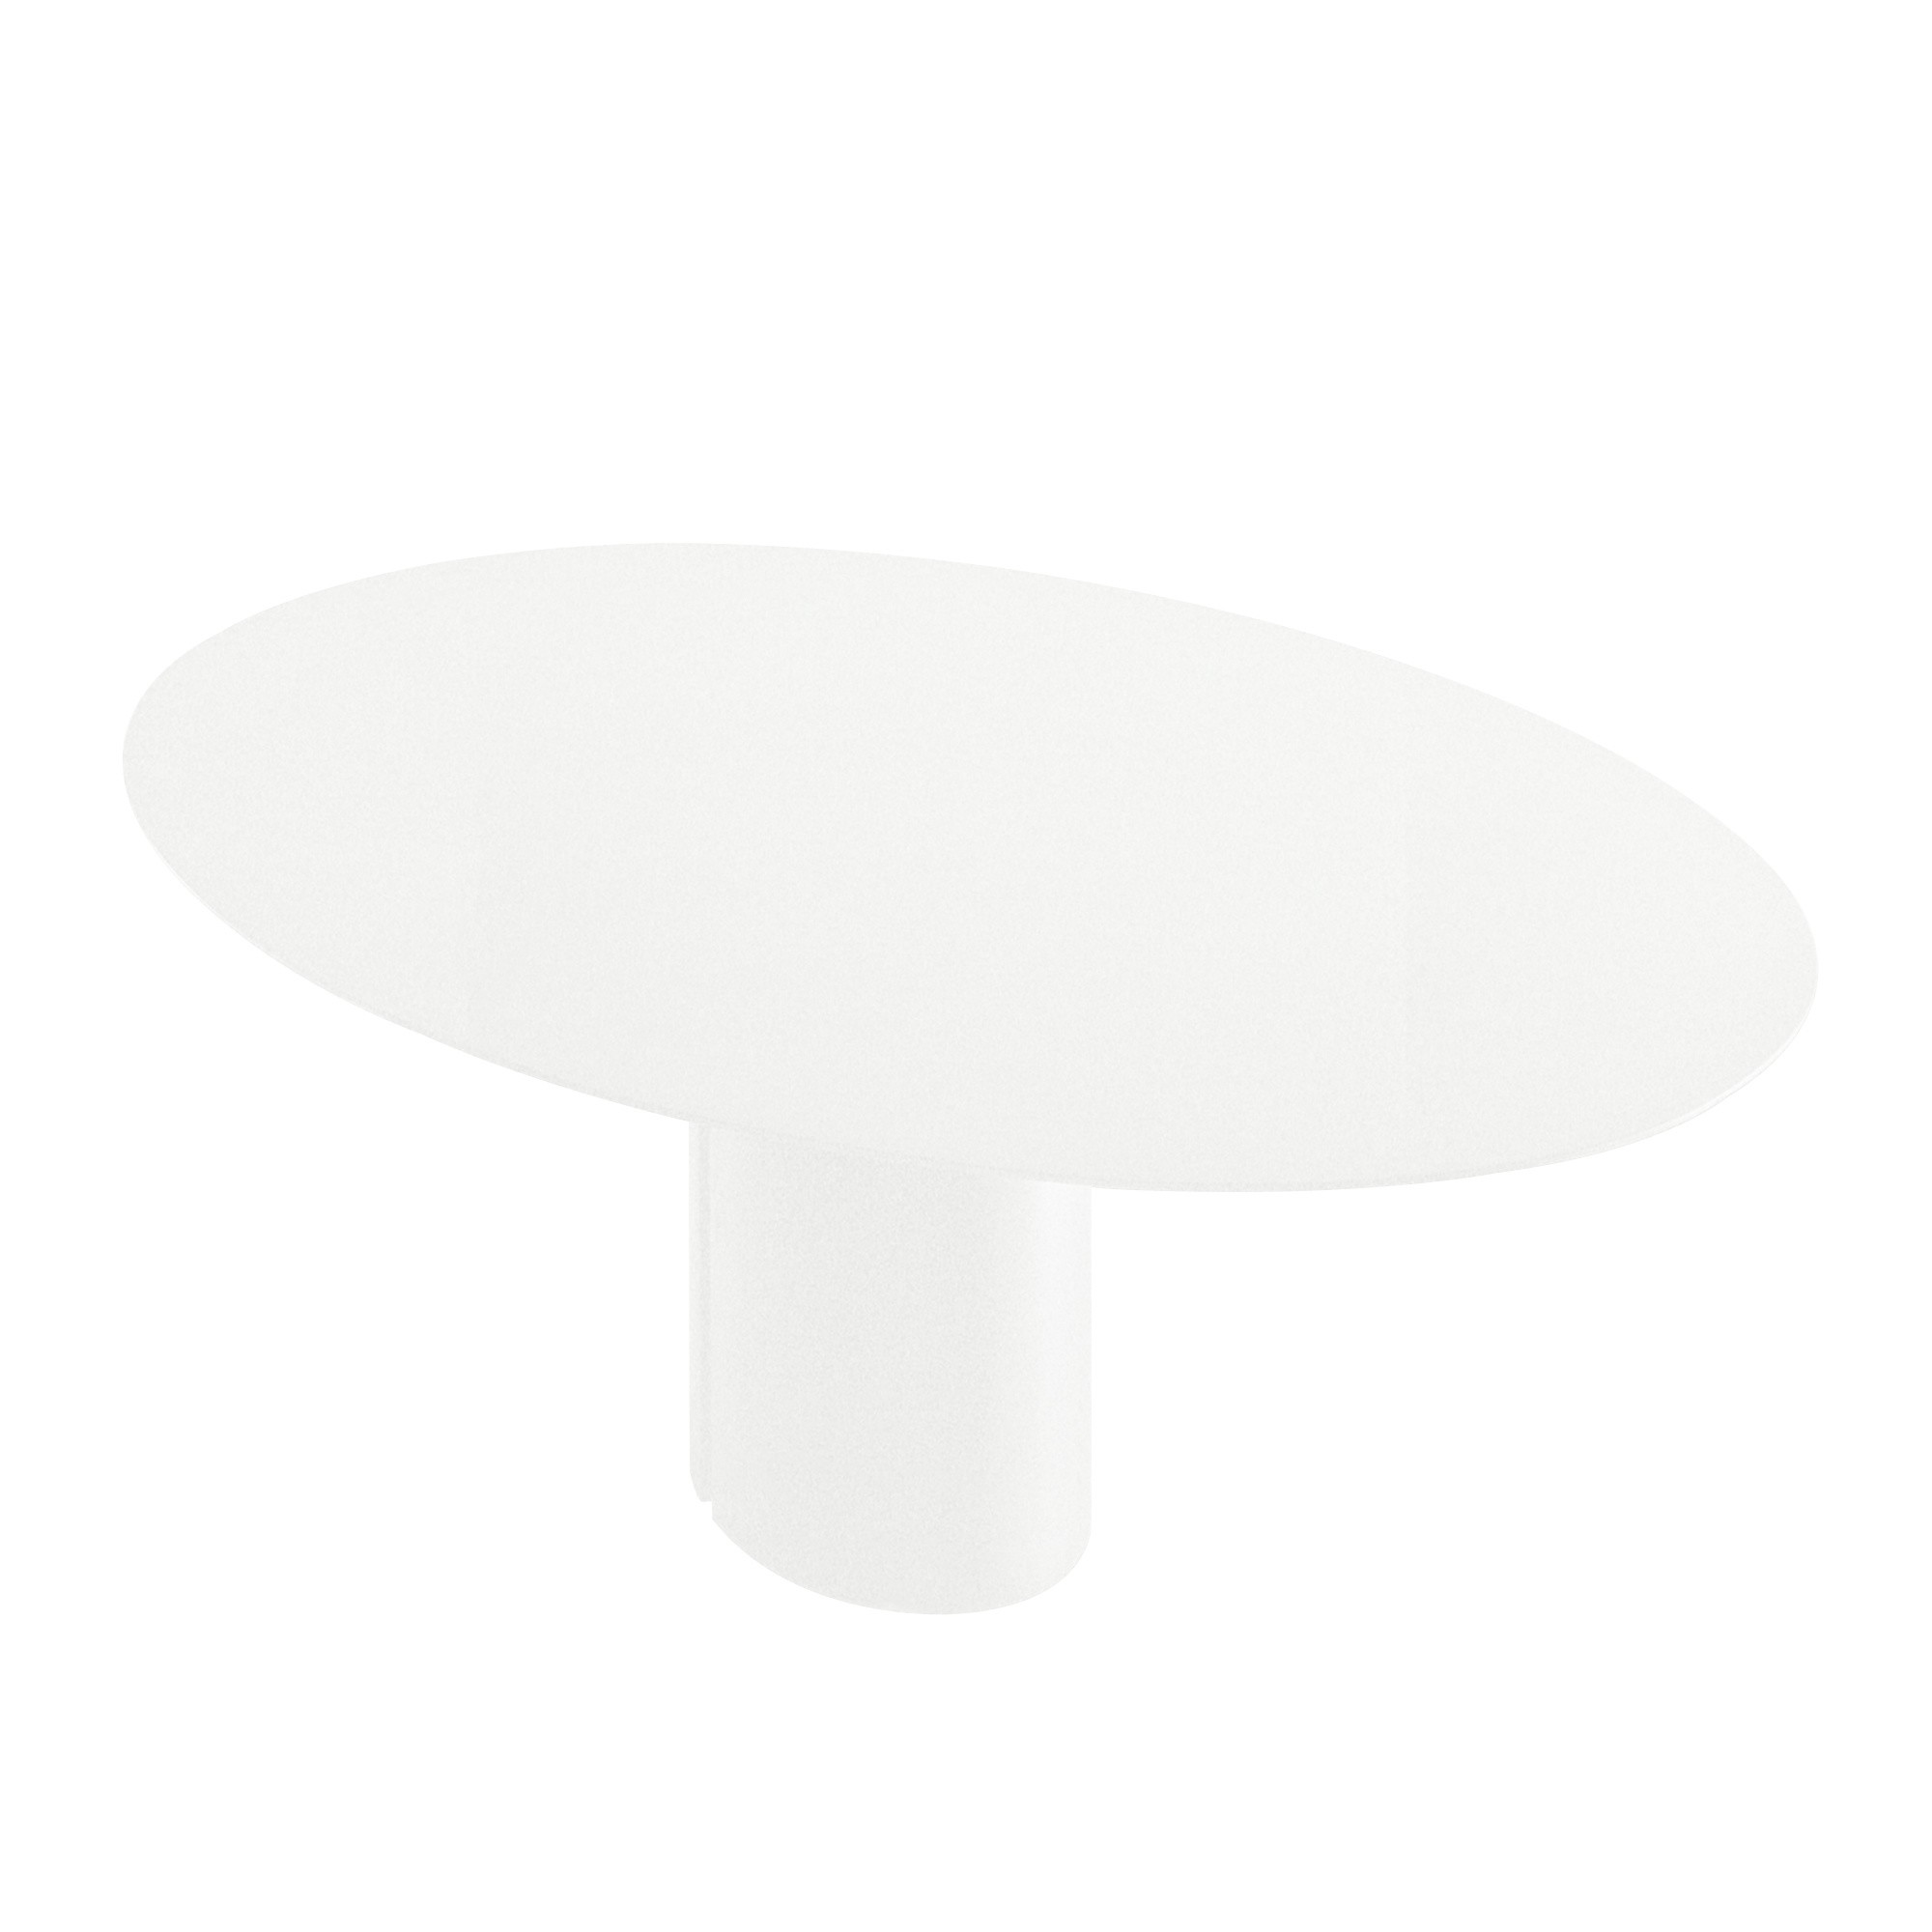 Mdf Italia Nvl Dining Table Oval 120x200cm Ambientedirect